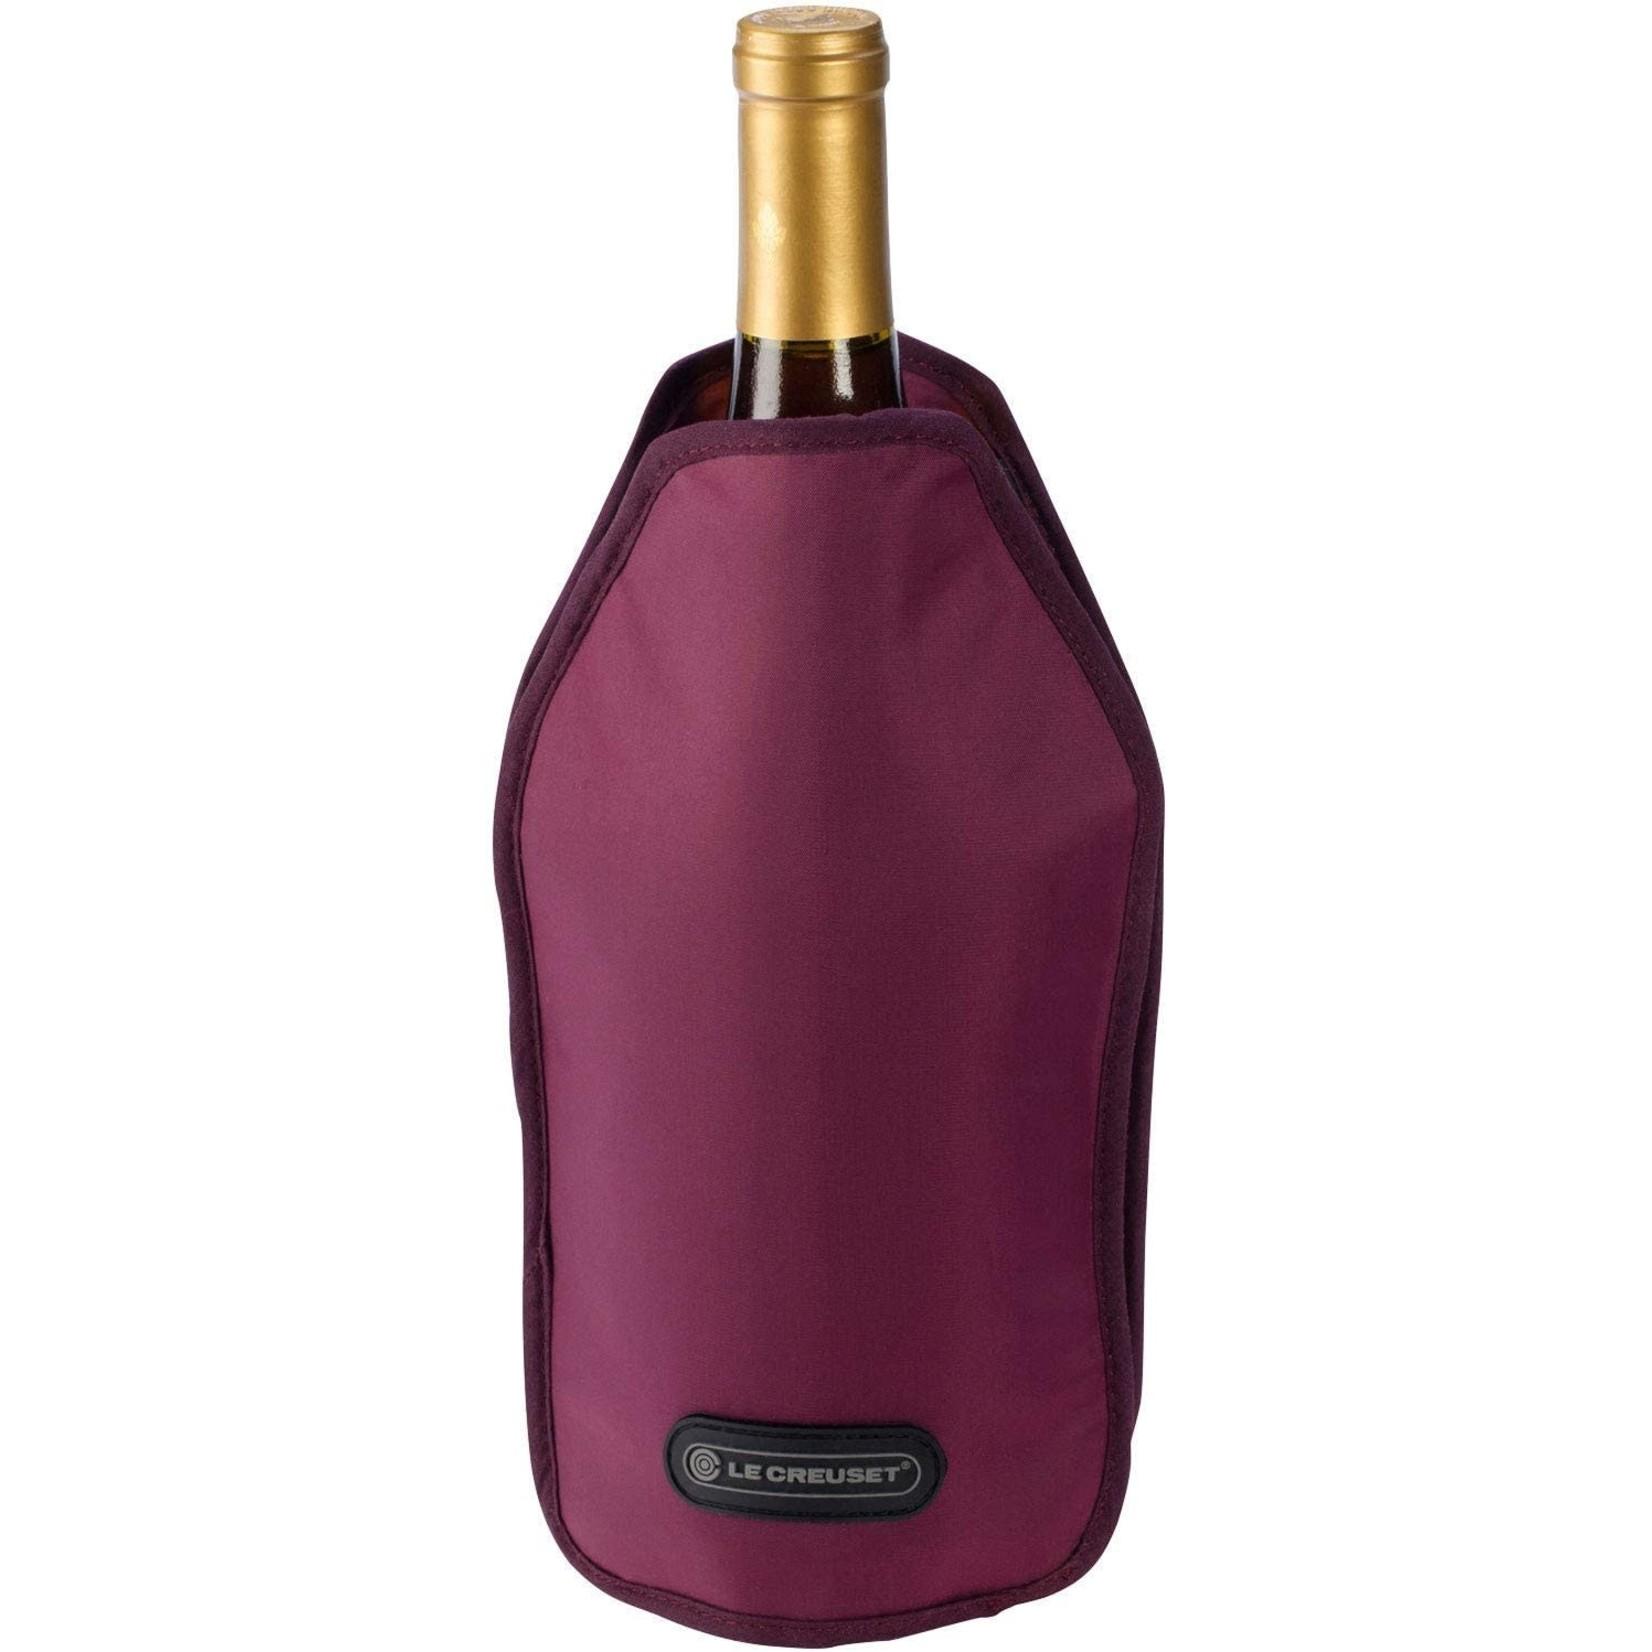 Le Creuset Wijnkoeler Bourgogne